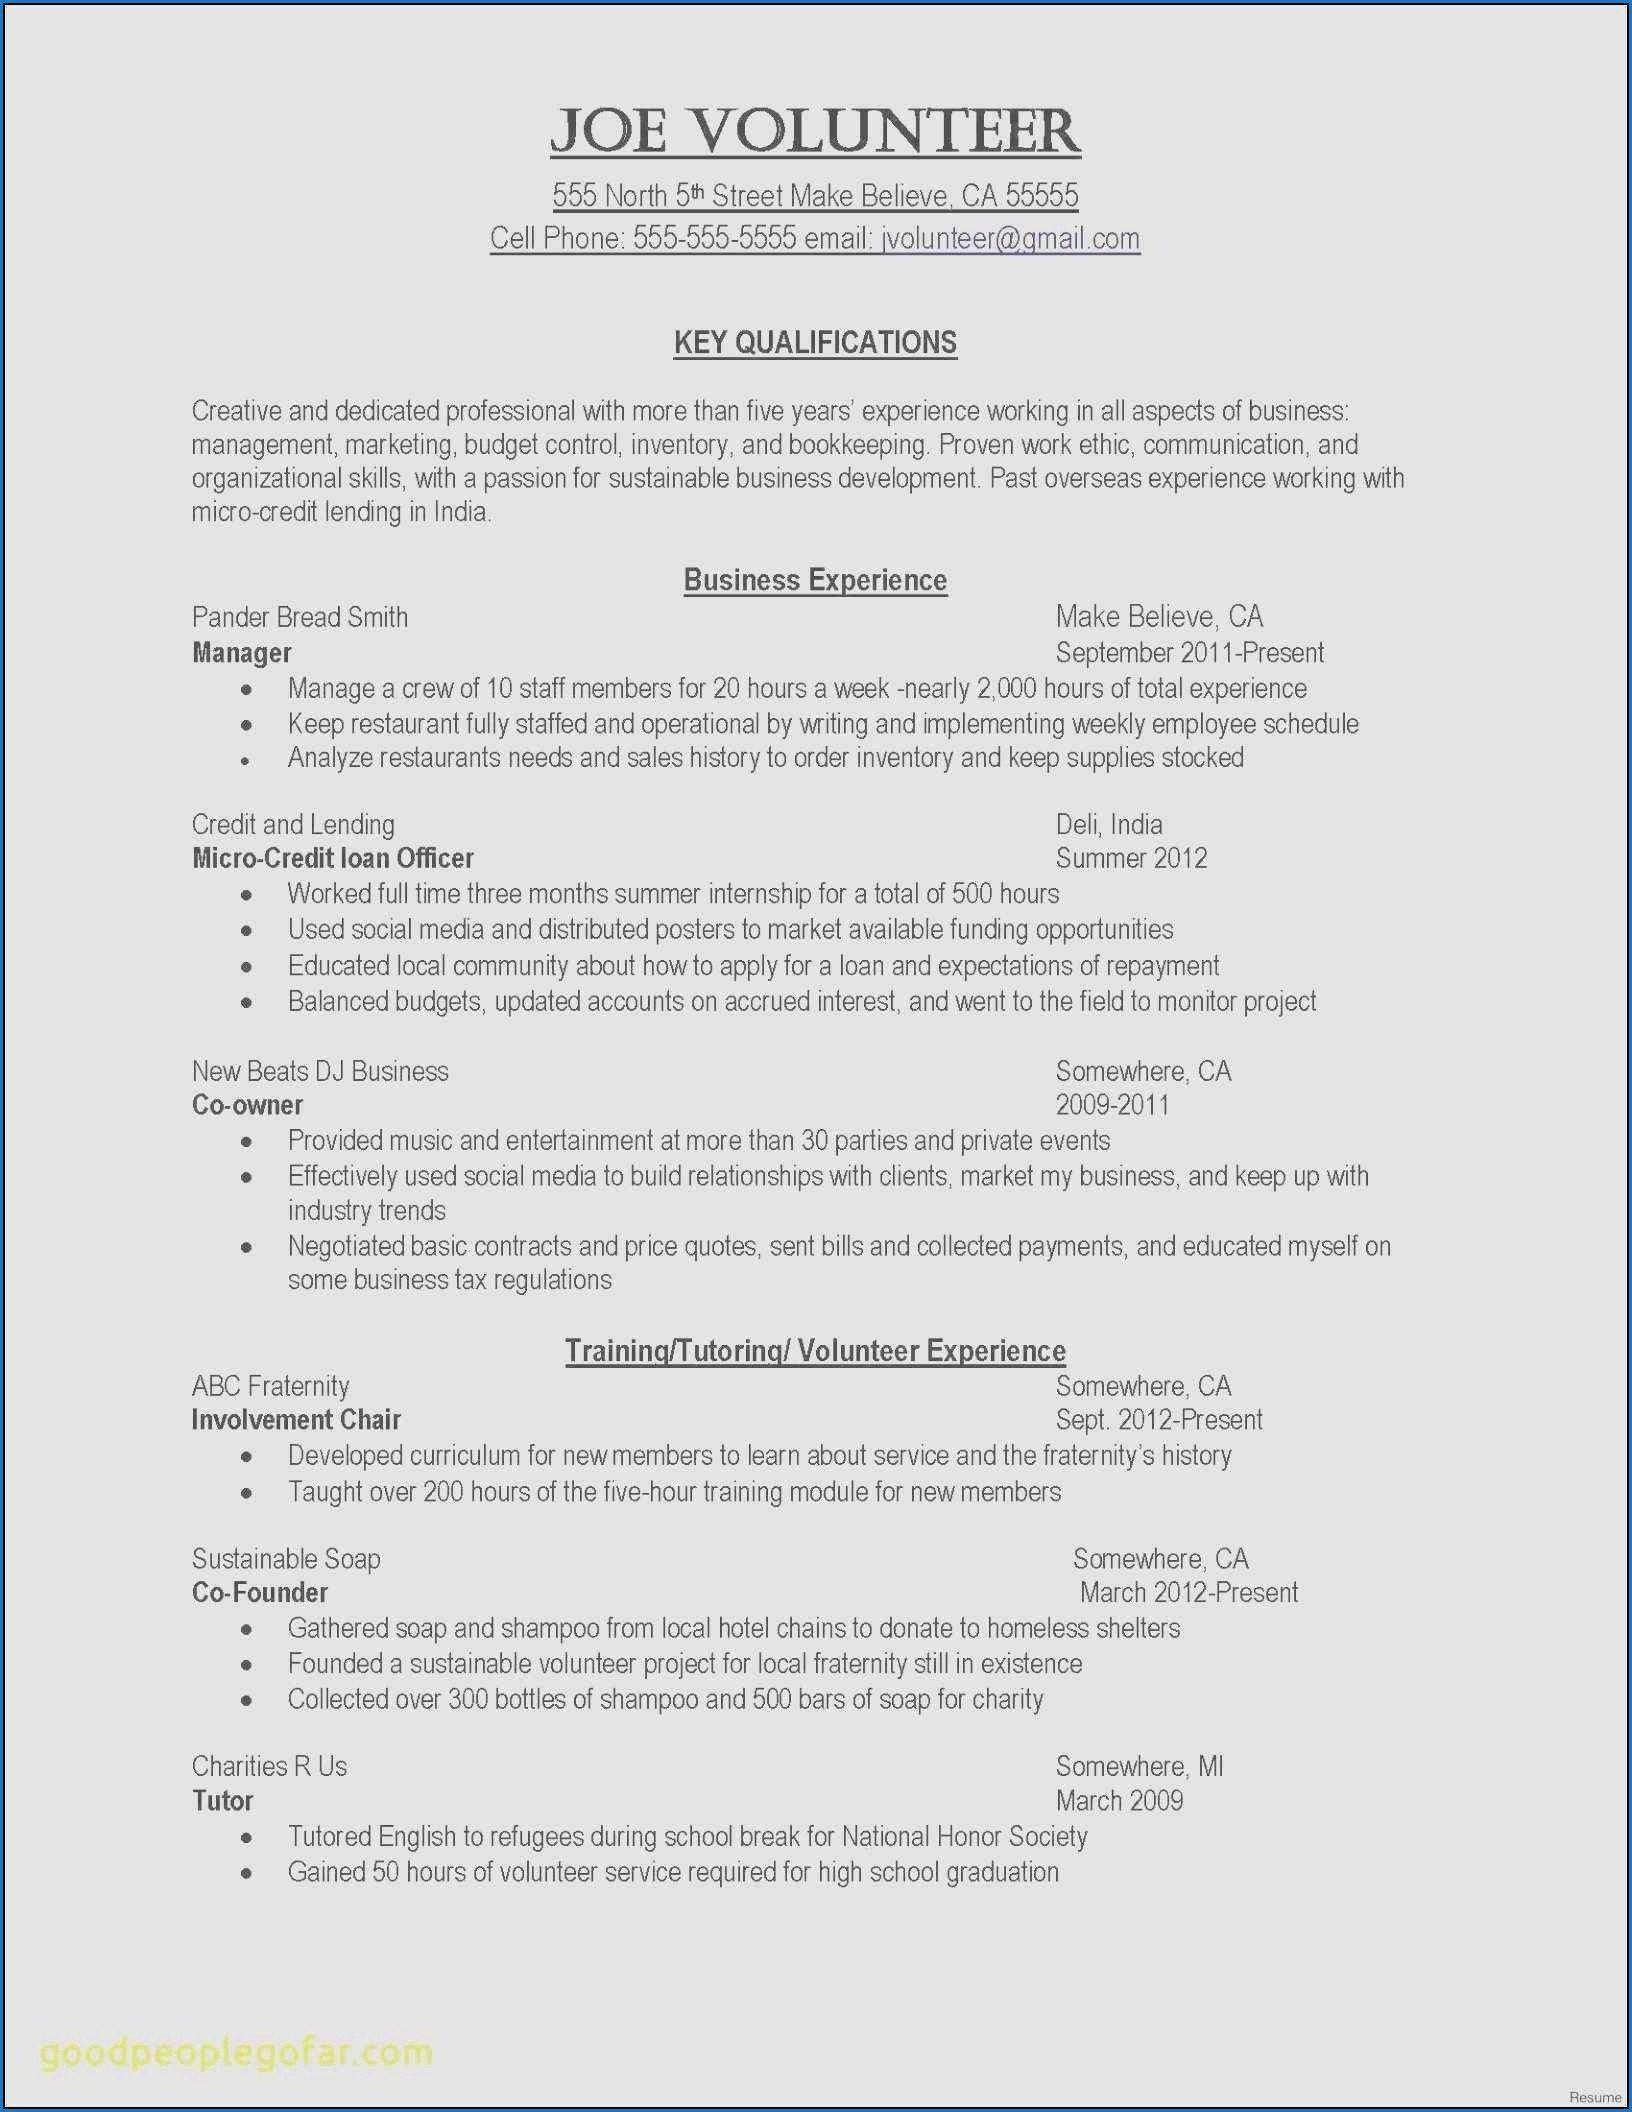 Social Media Skills Resume Work Resume Examples With Work History New Resume Work